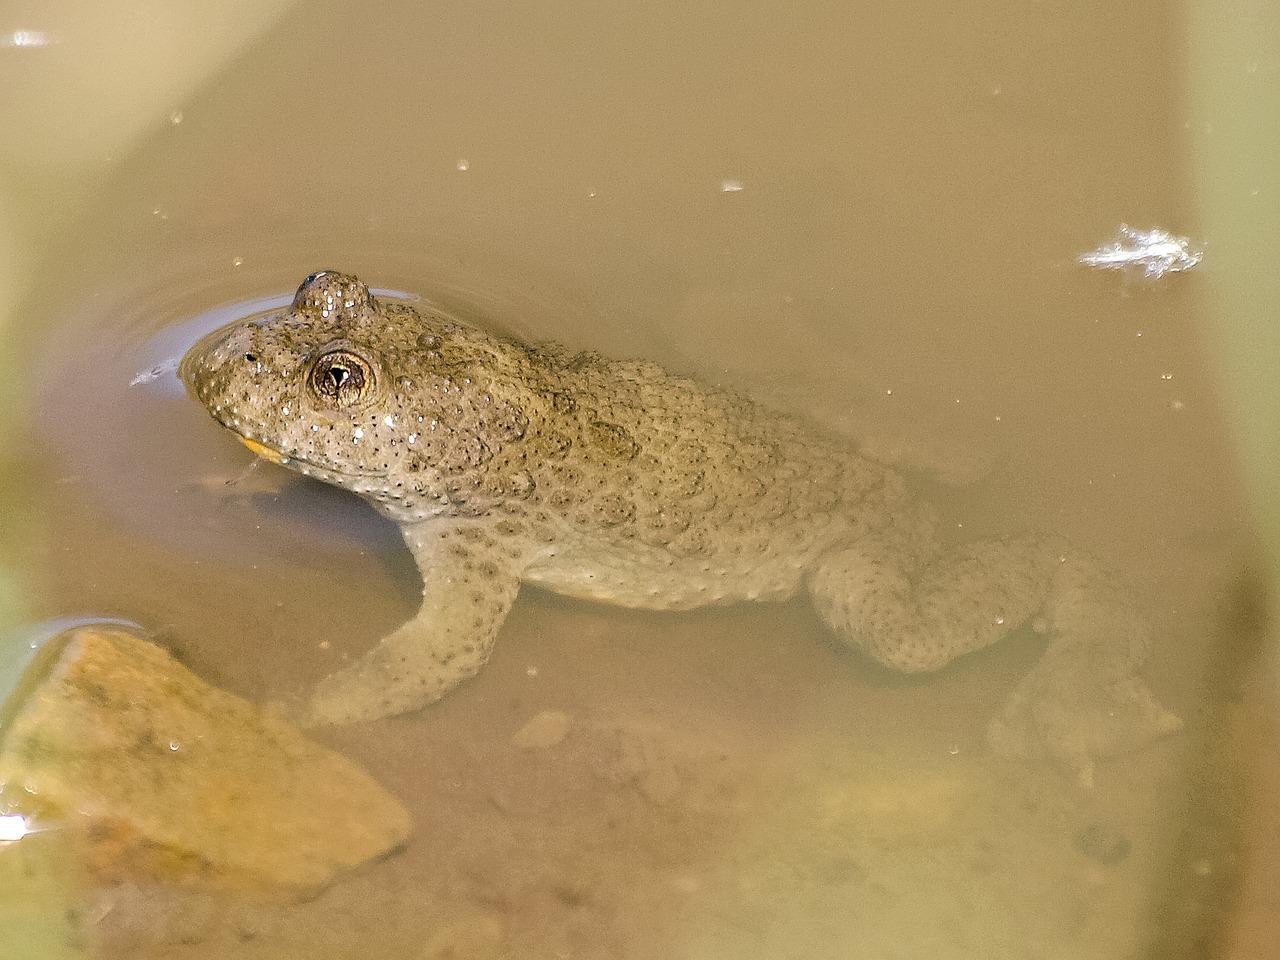 Yellow toad animal